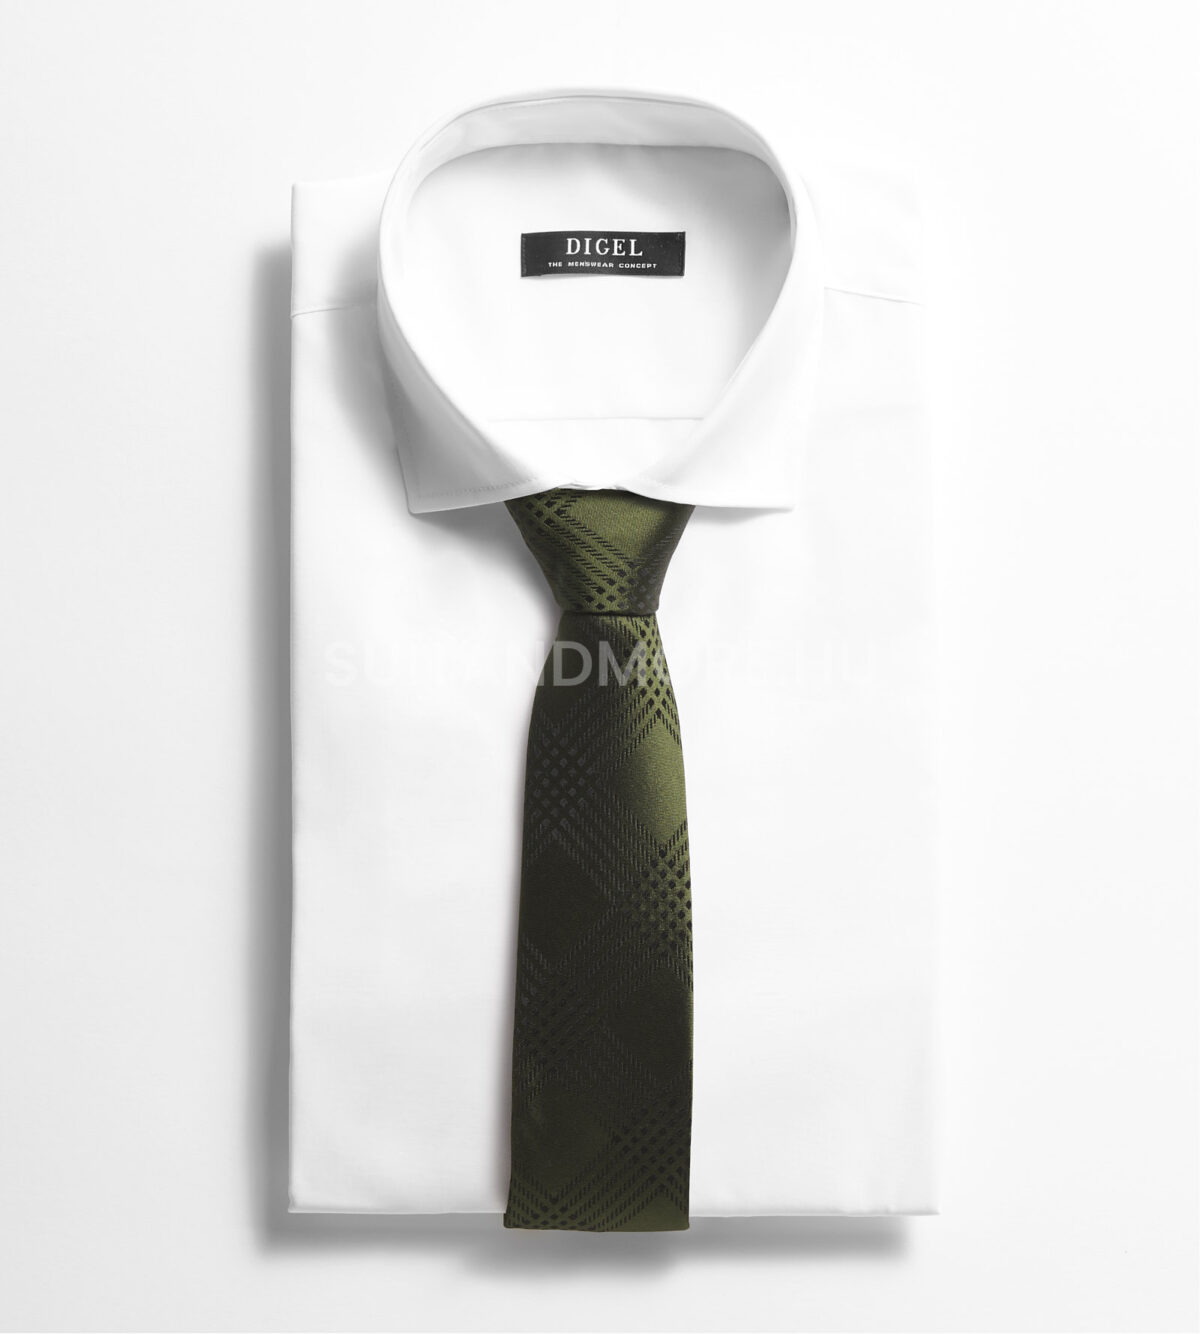 digel-zold-apromintas-selyem-nyakkendo-dunhill-1299020-52-02